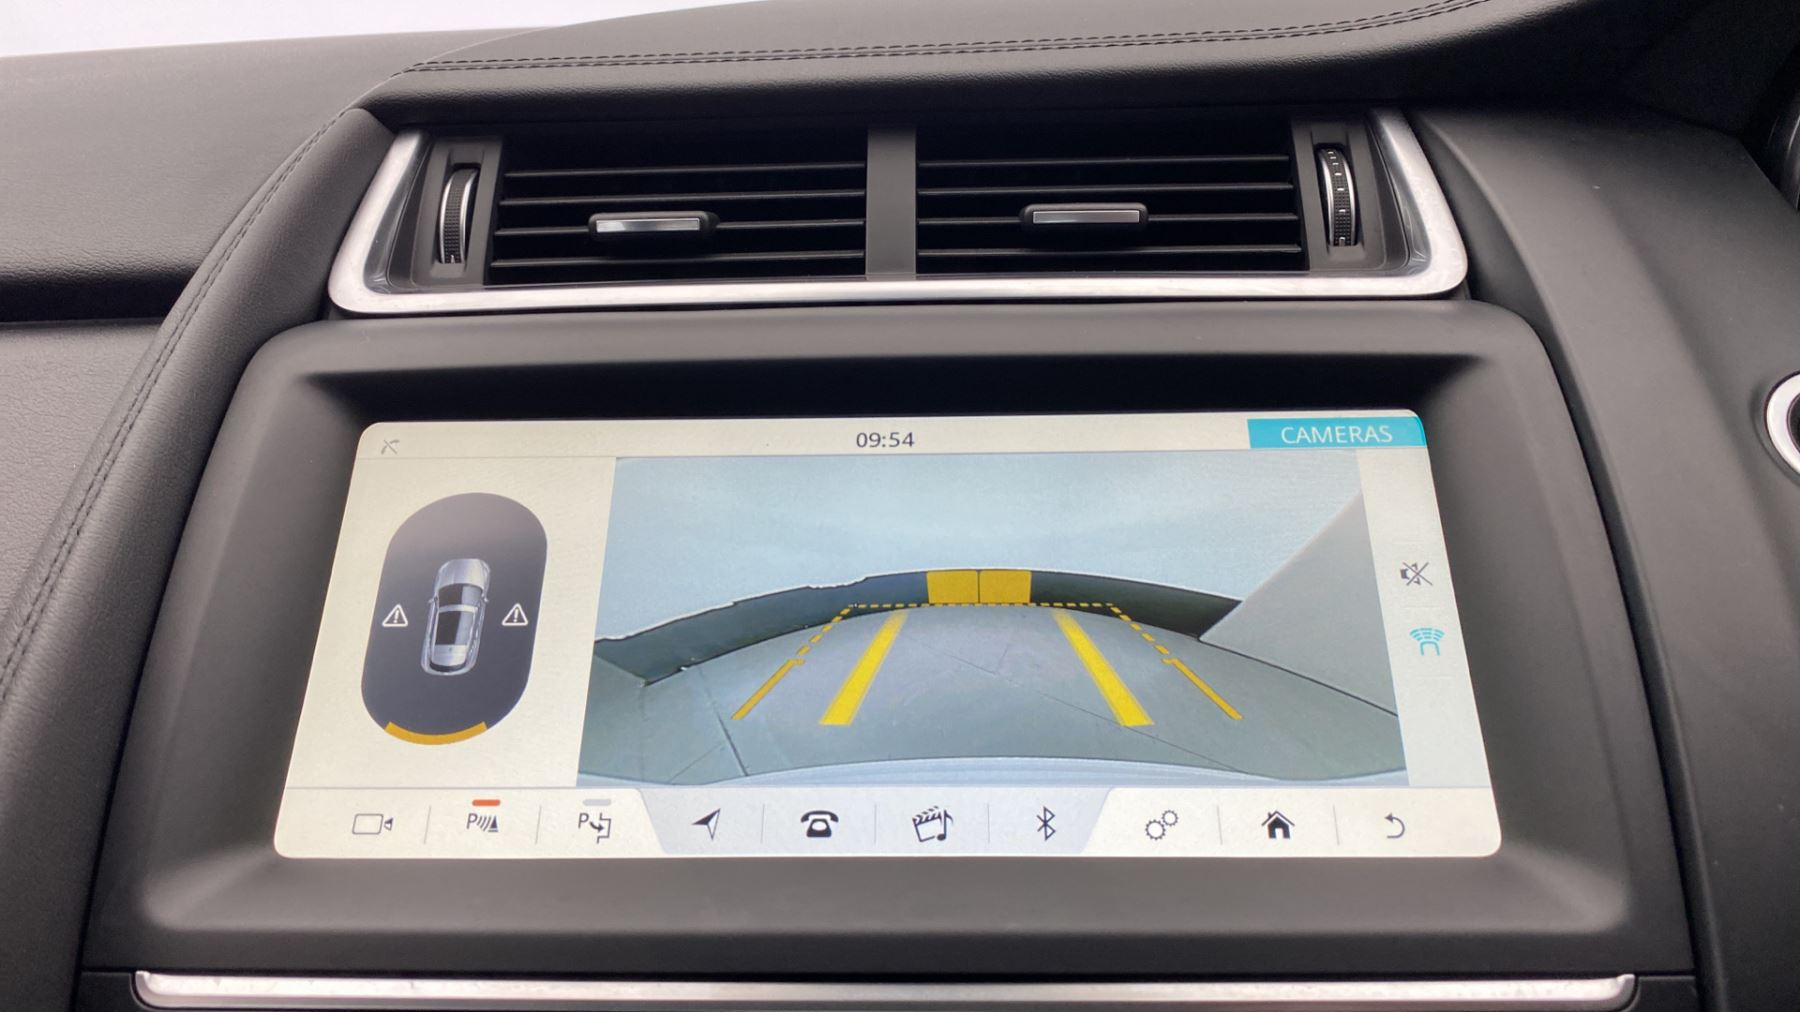 Jaguar E-PACE 2.0d SE AWD - Meridian Sound System - Powered Seats - Satellite Navigation image 28